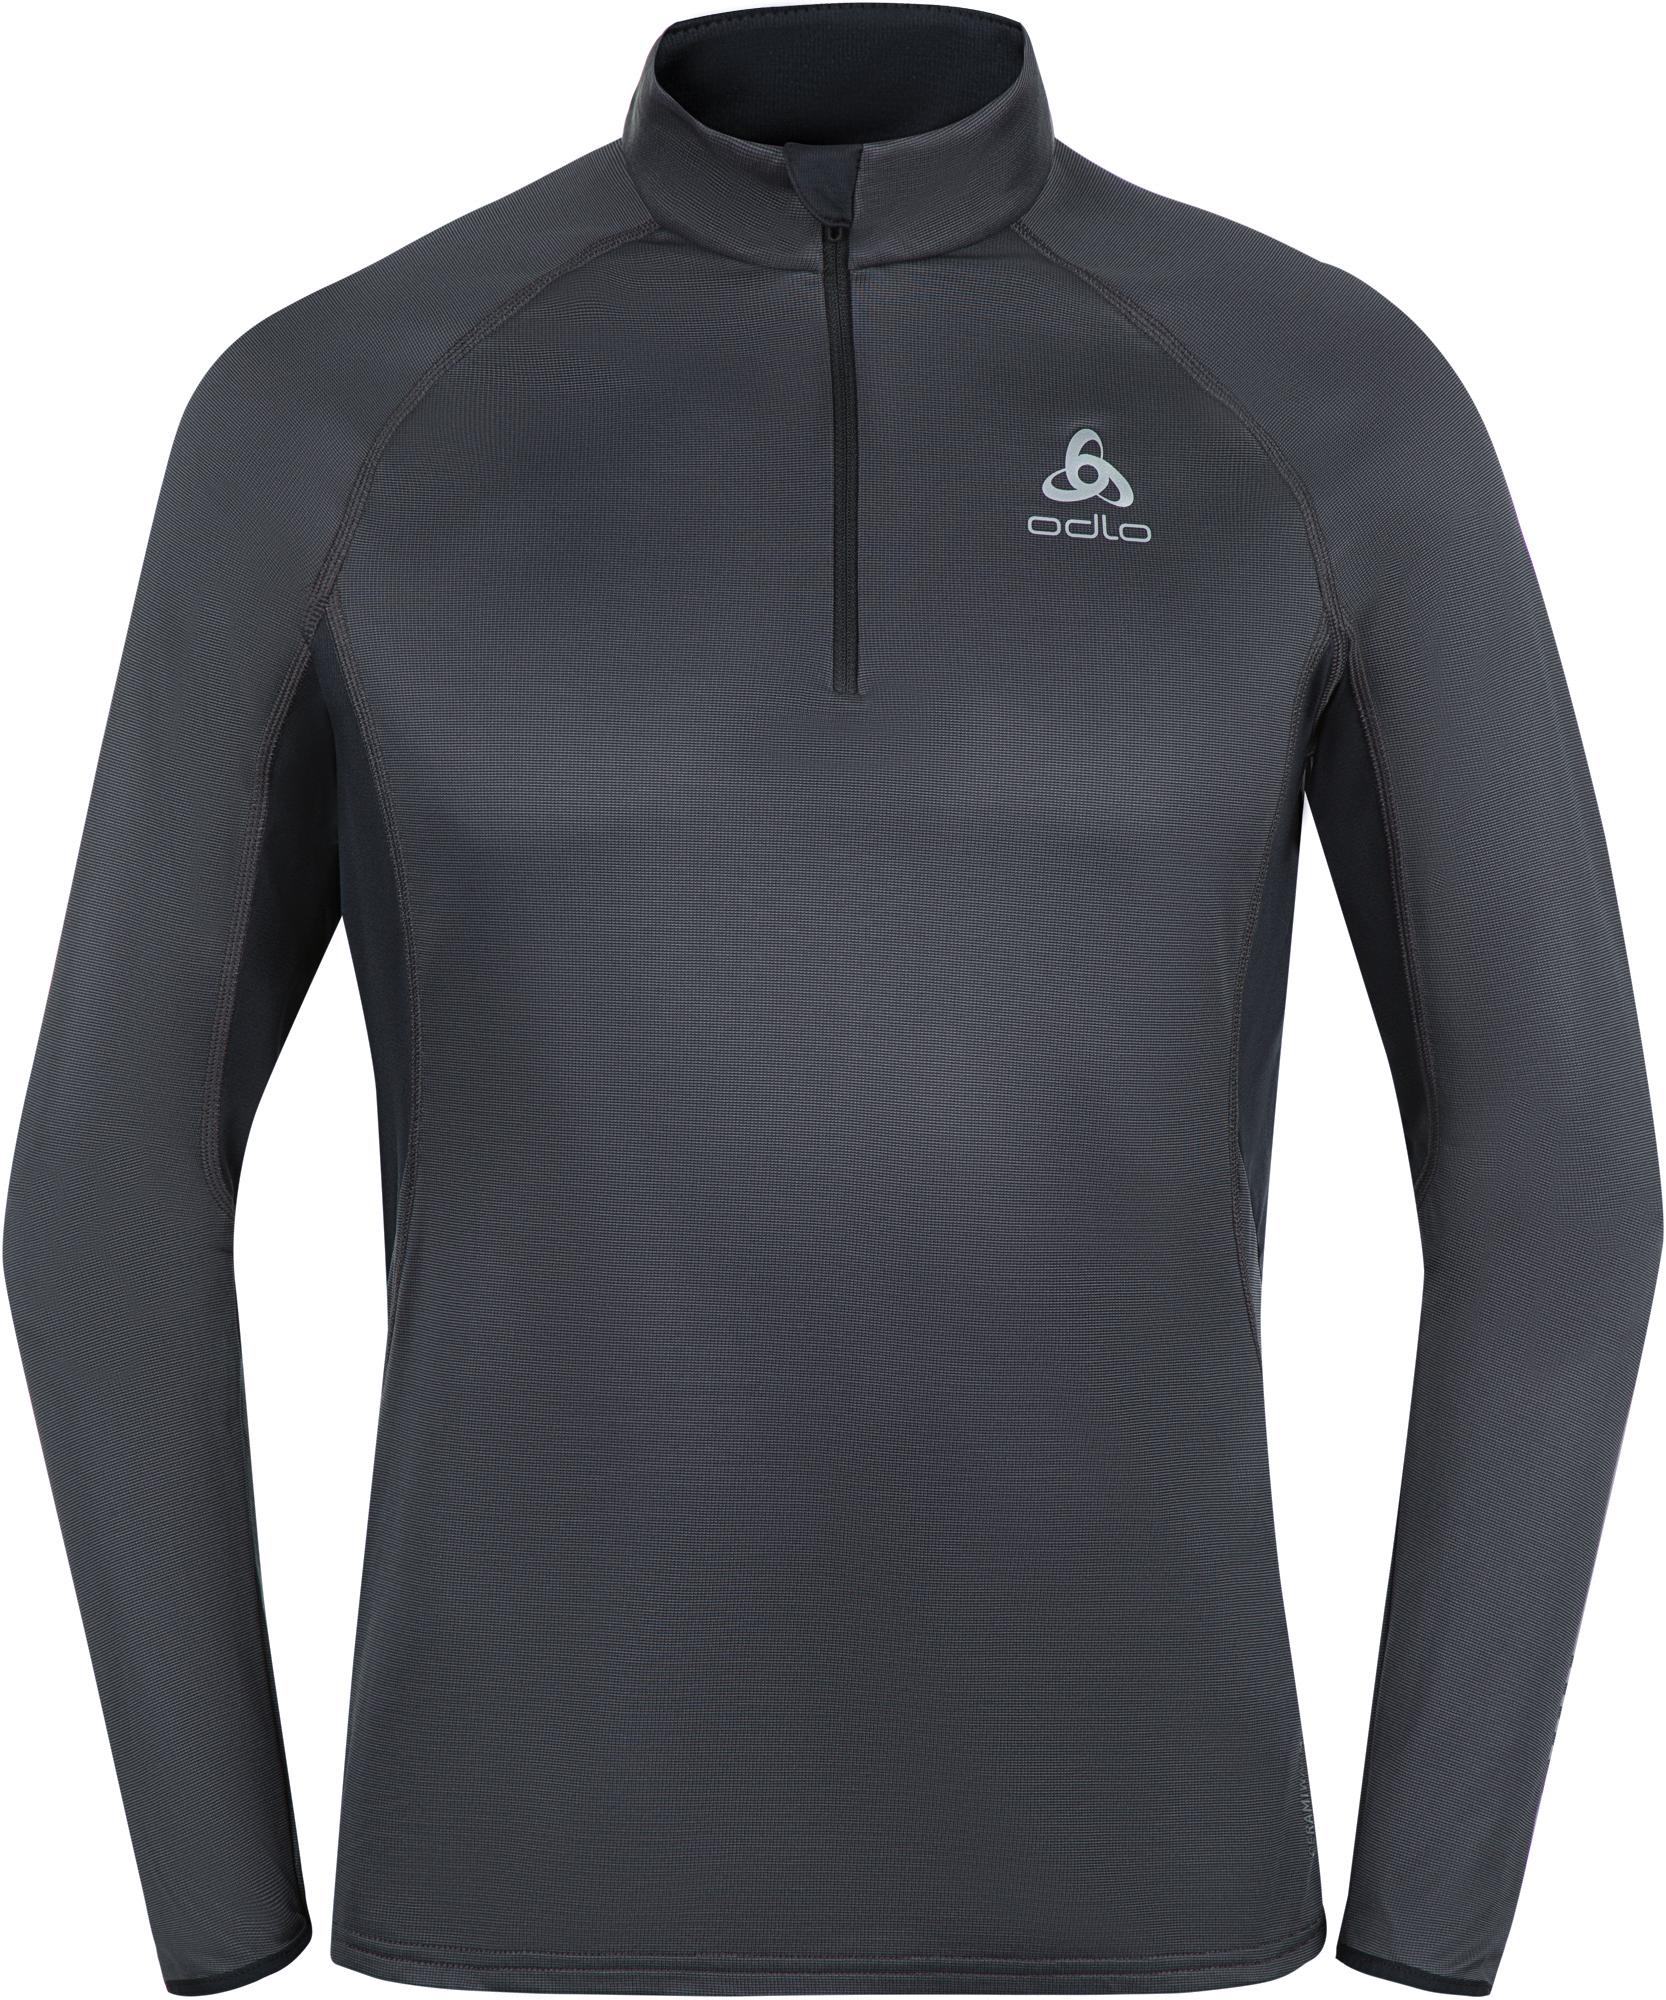 цена Odlo Олимпийка мужская Odlo Zeroweight Ceramiwarm, размер 48-50 онлайн в 2017 году